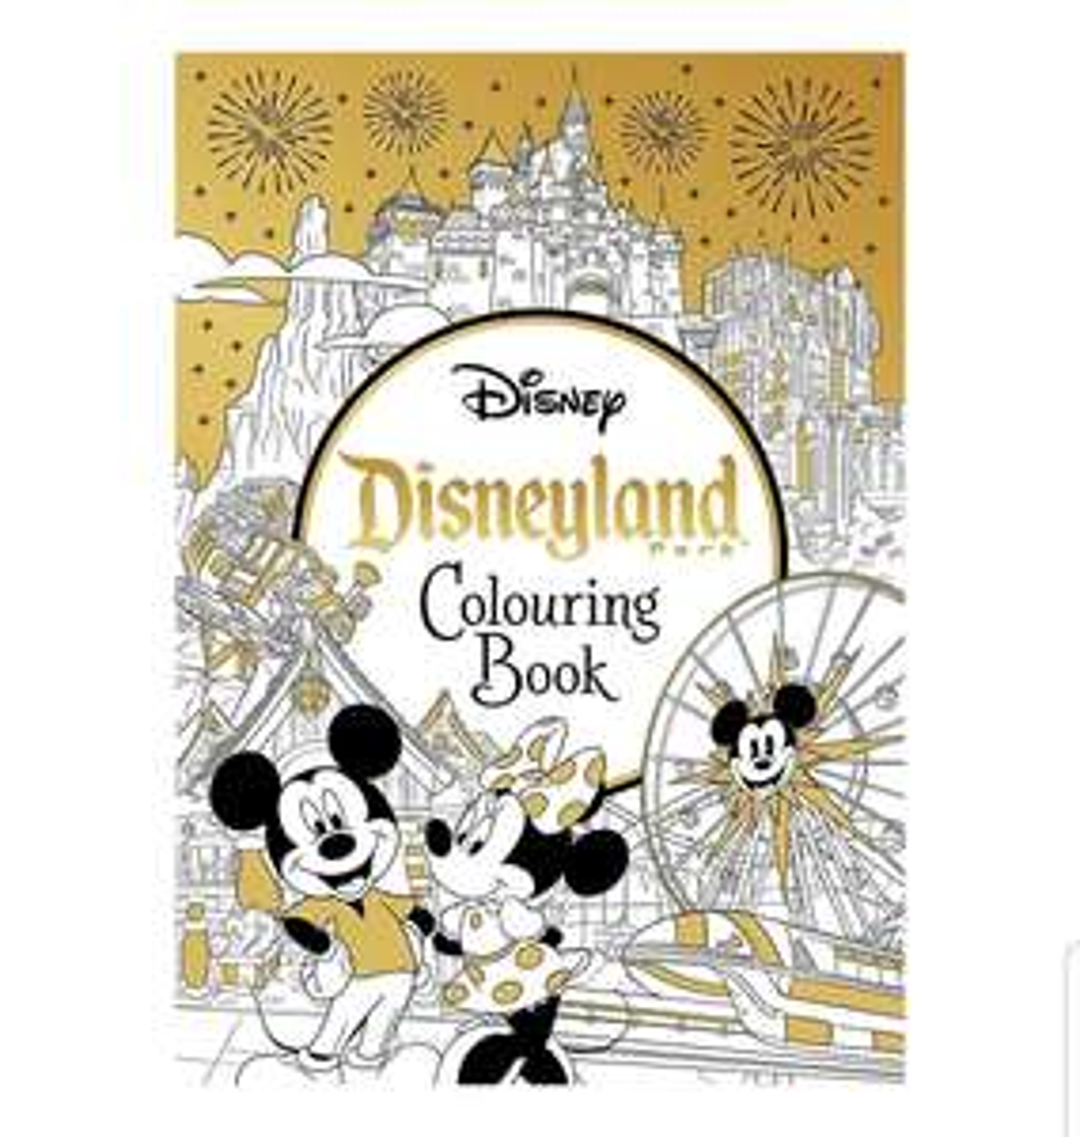 Disneyland Parks Colouring Book £4 prime / £6.99 nonPrime @ Amazon